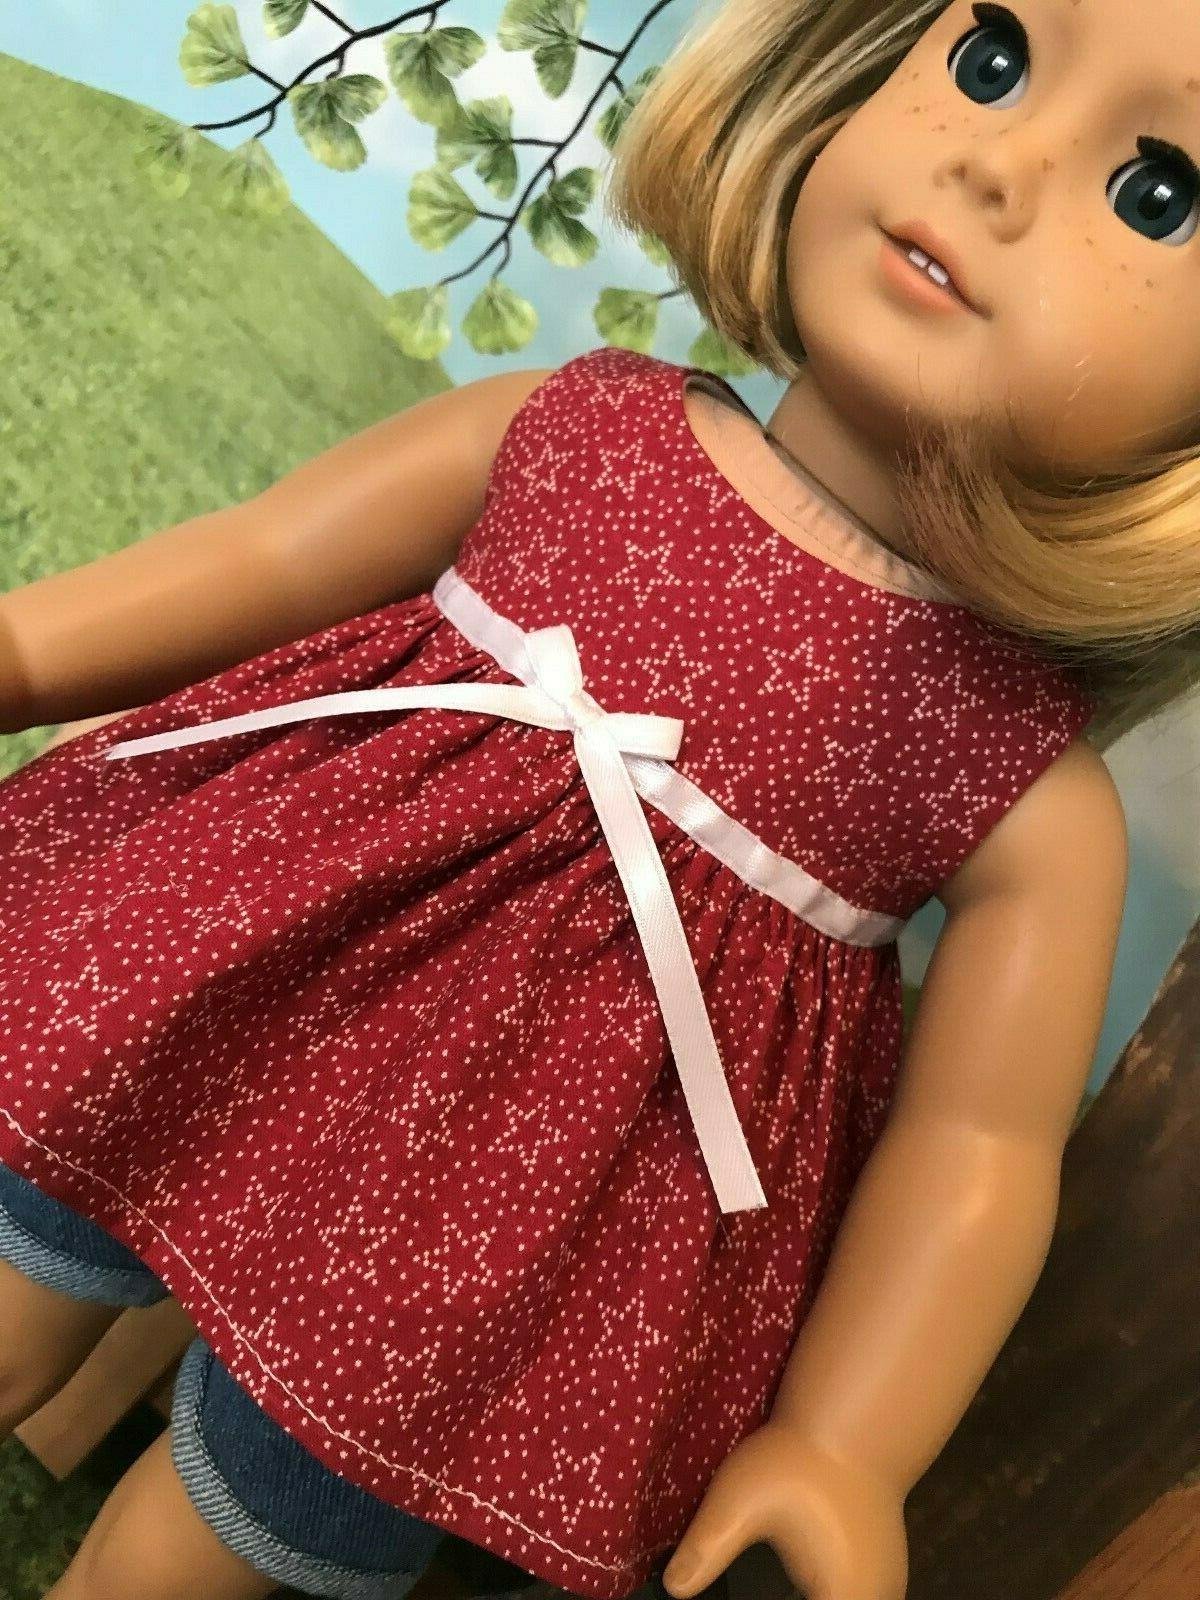 of short 18 inch doll